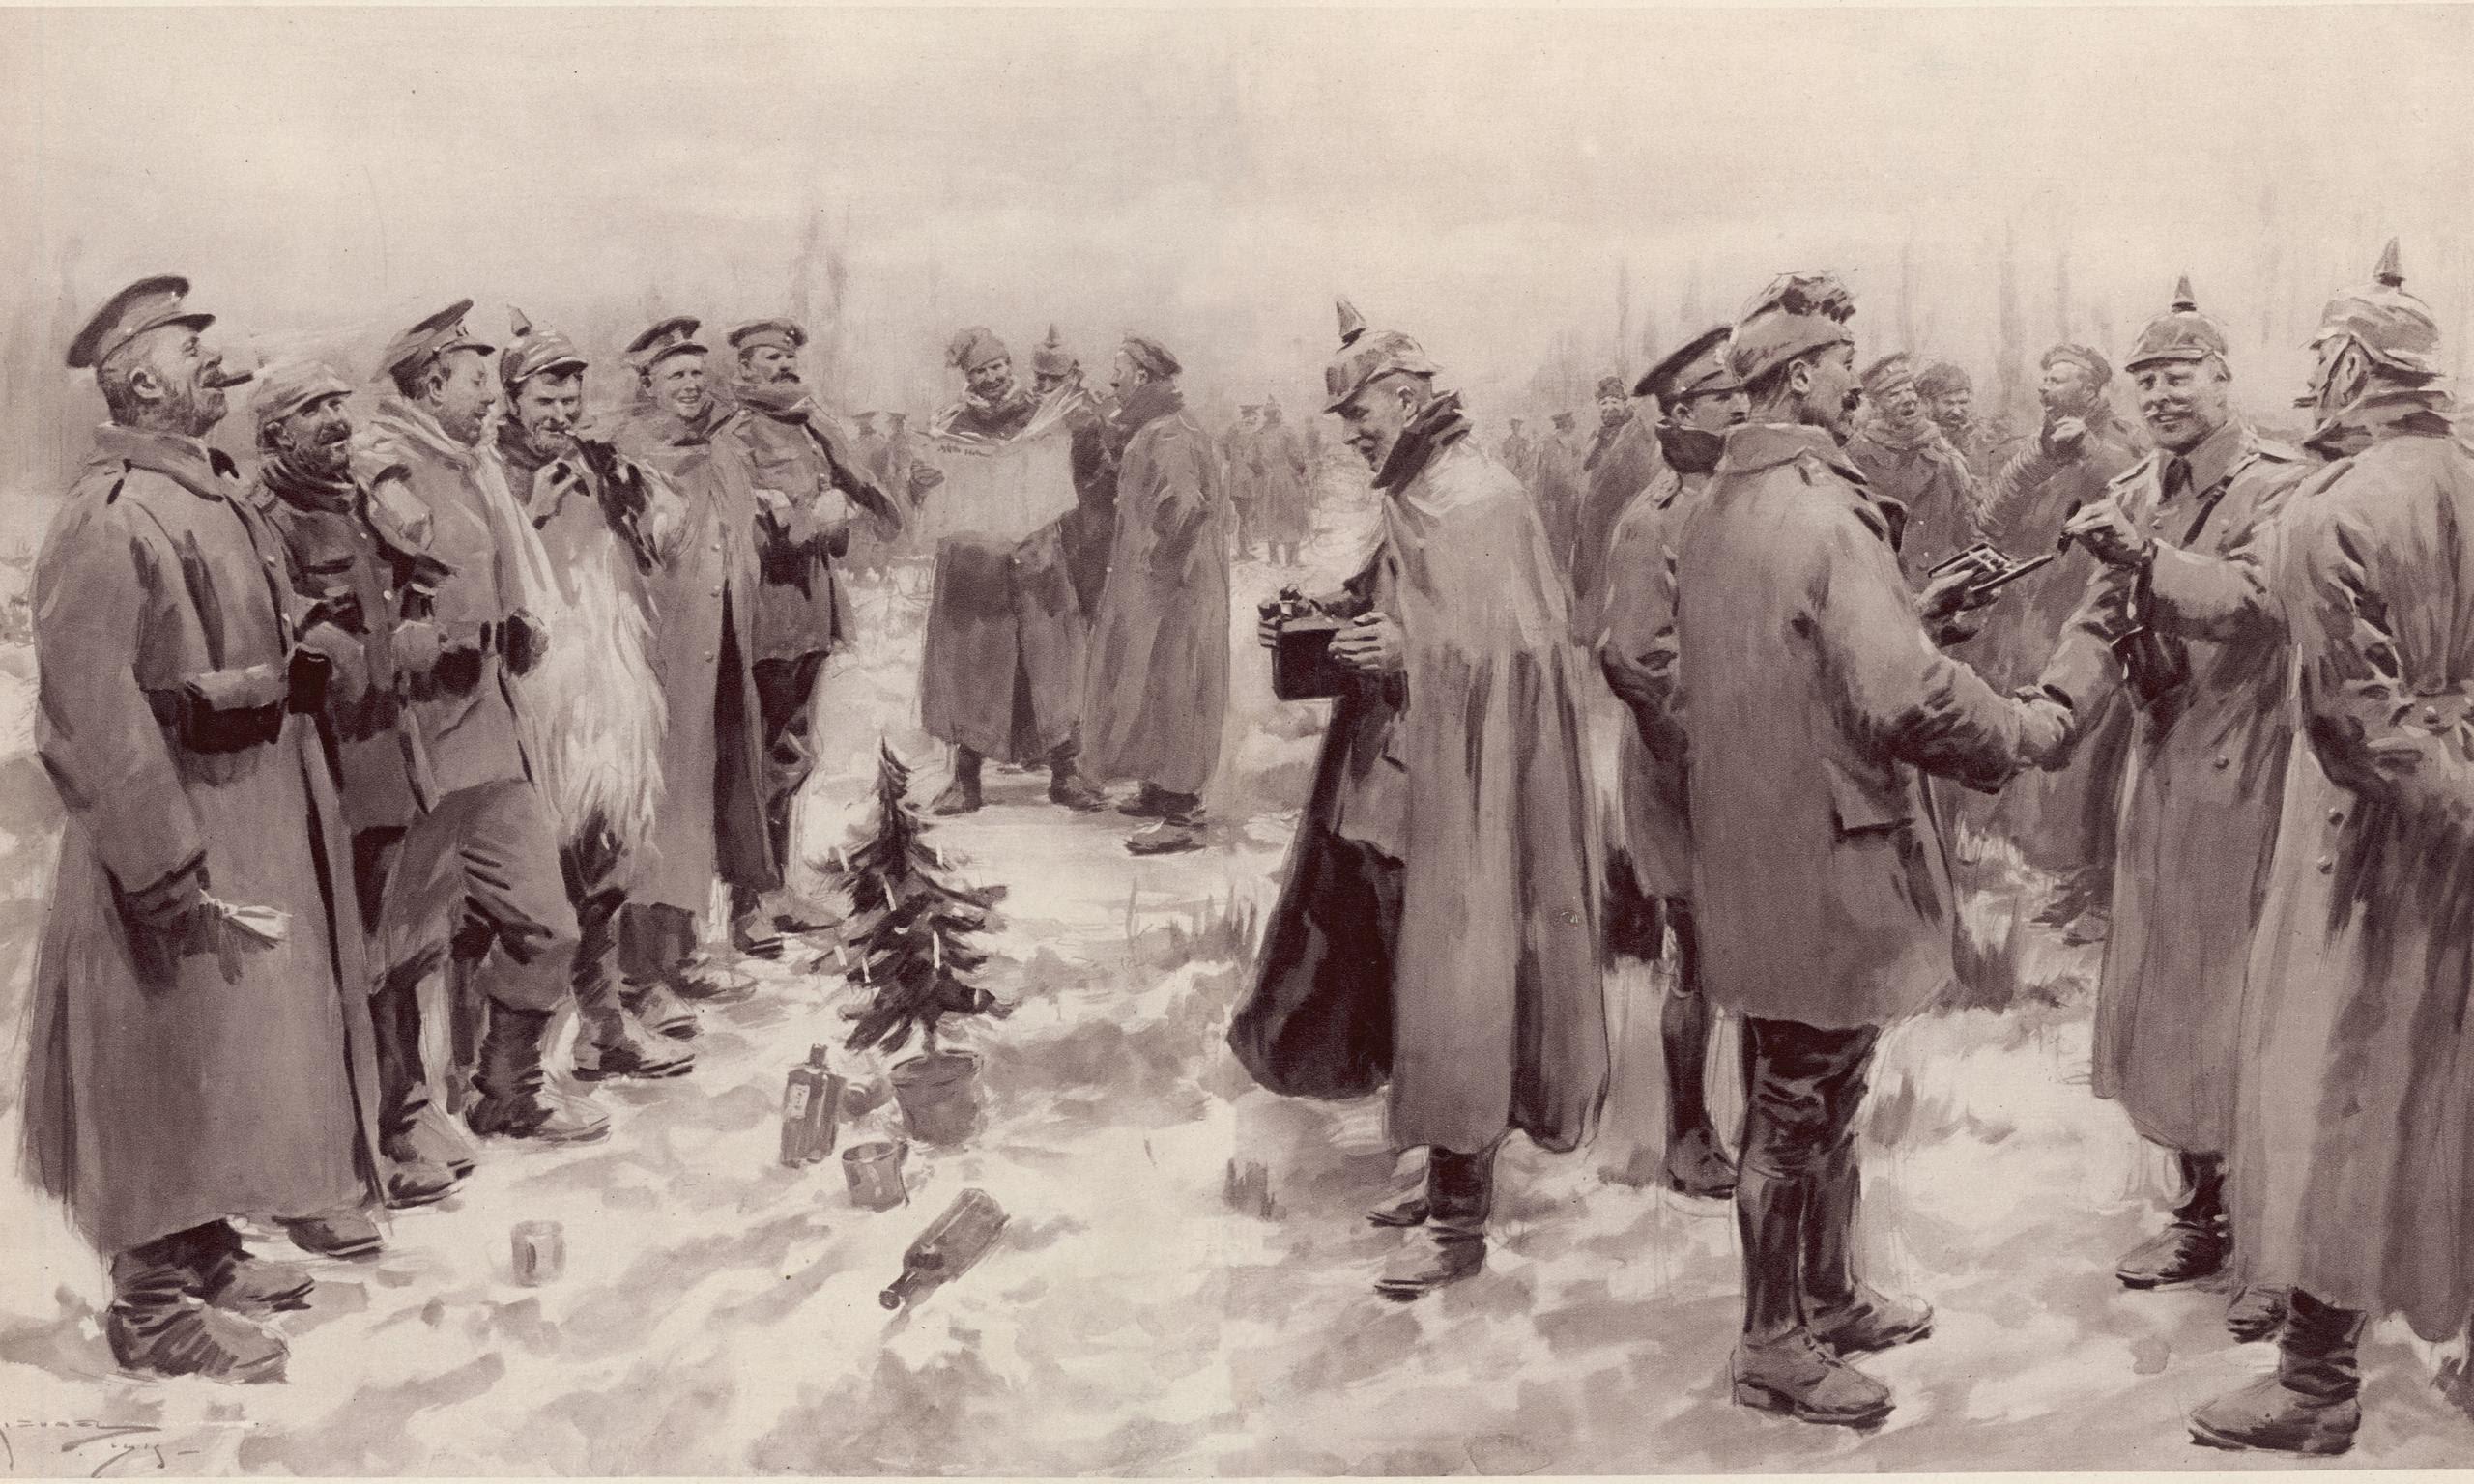 http://upload.wikimedia.org/wikipedia/en/4/42/Illustrated_London_News_-_Christmas_Truce_1914.jpg